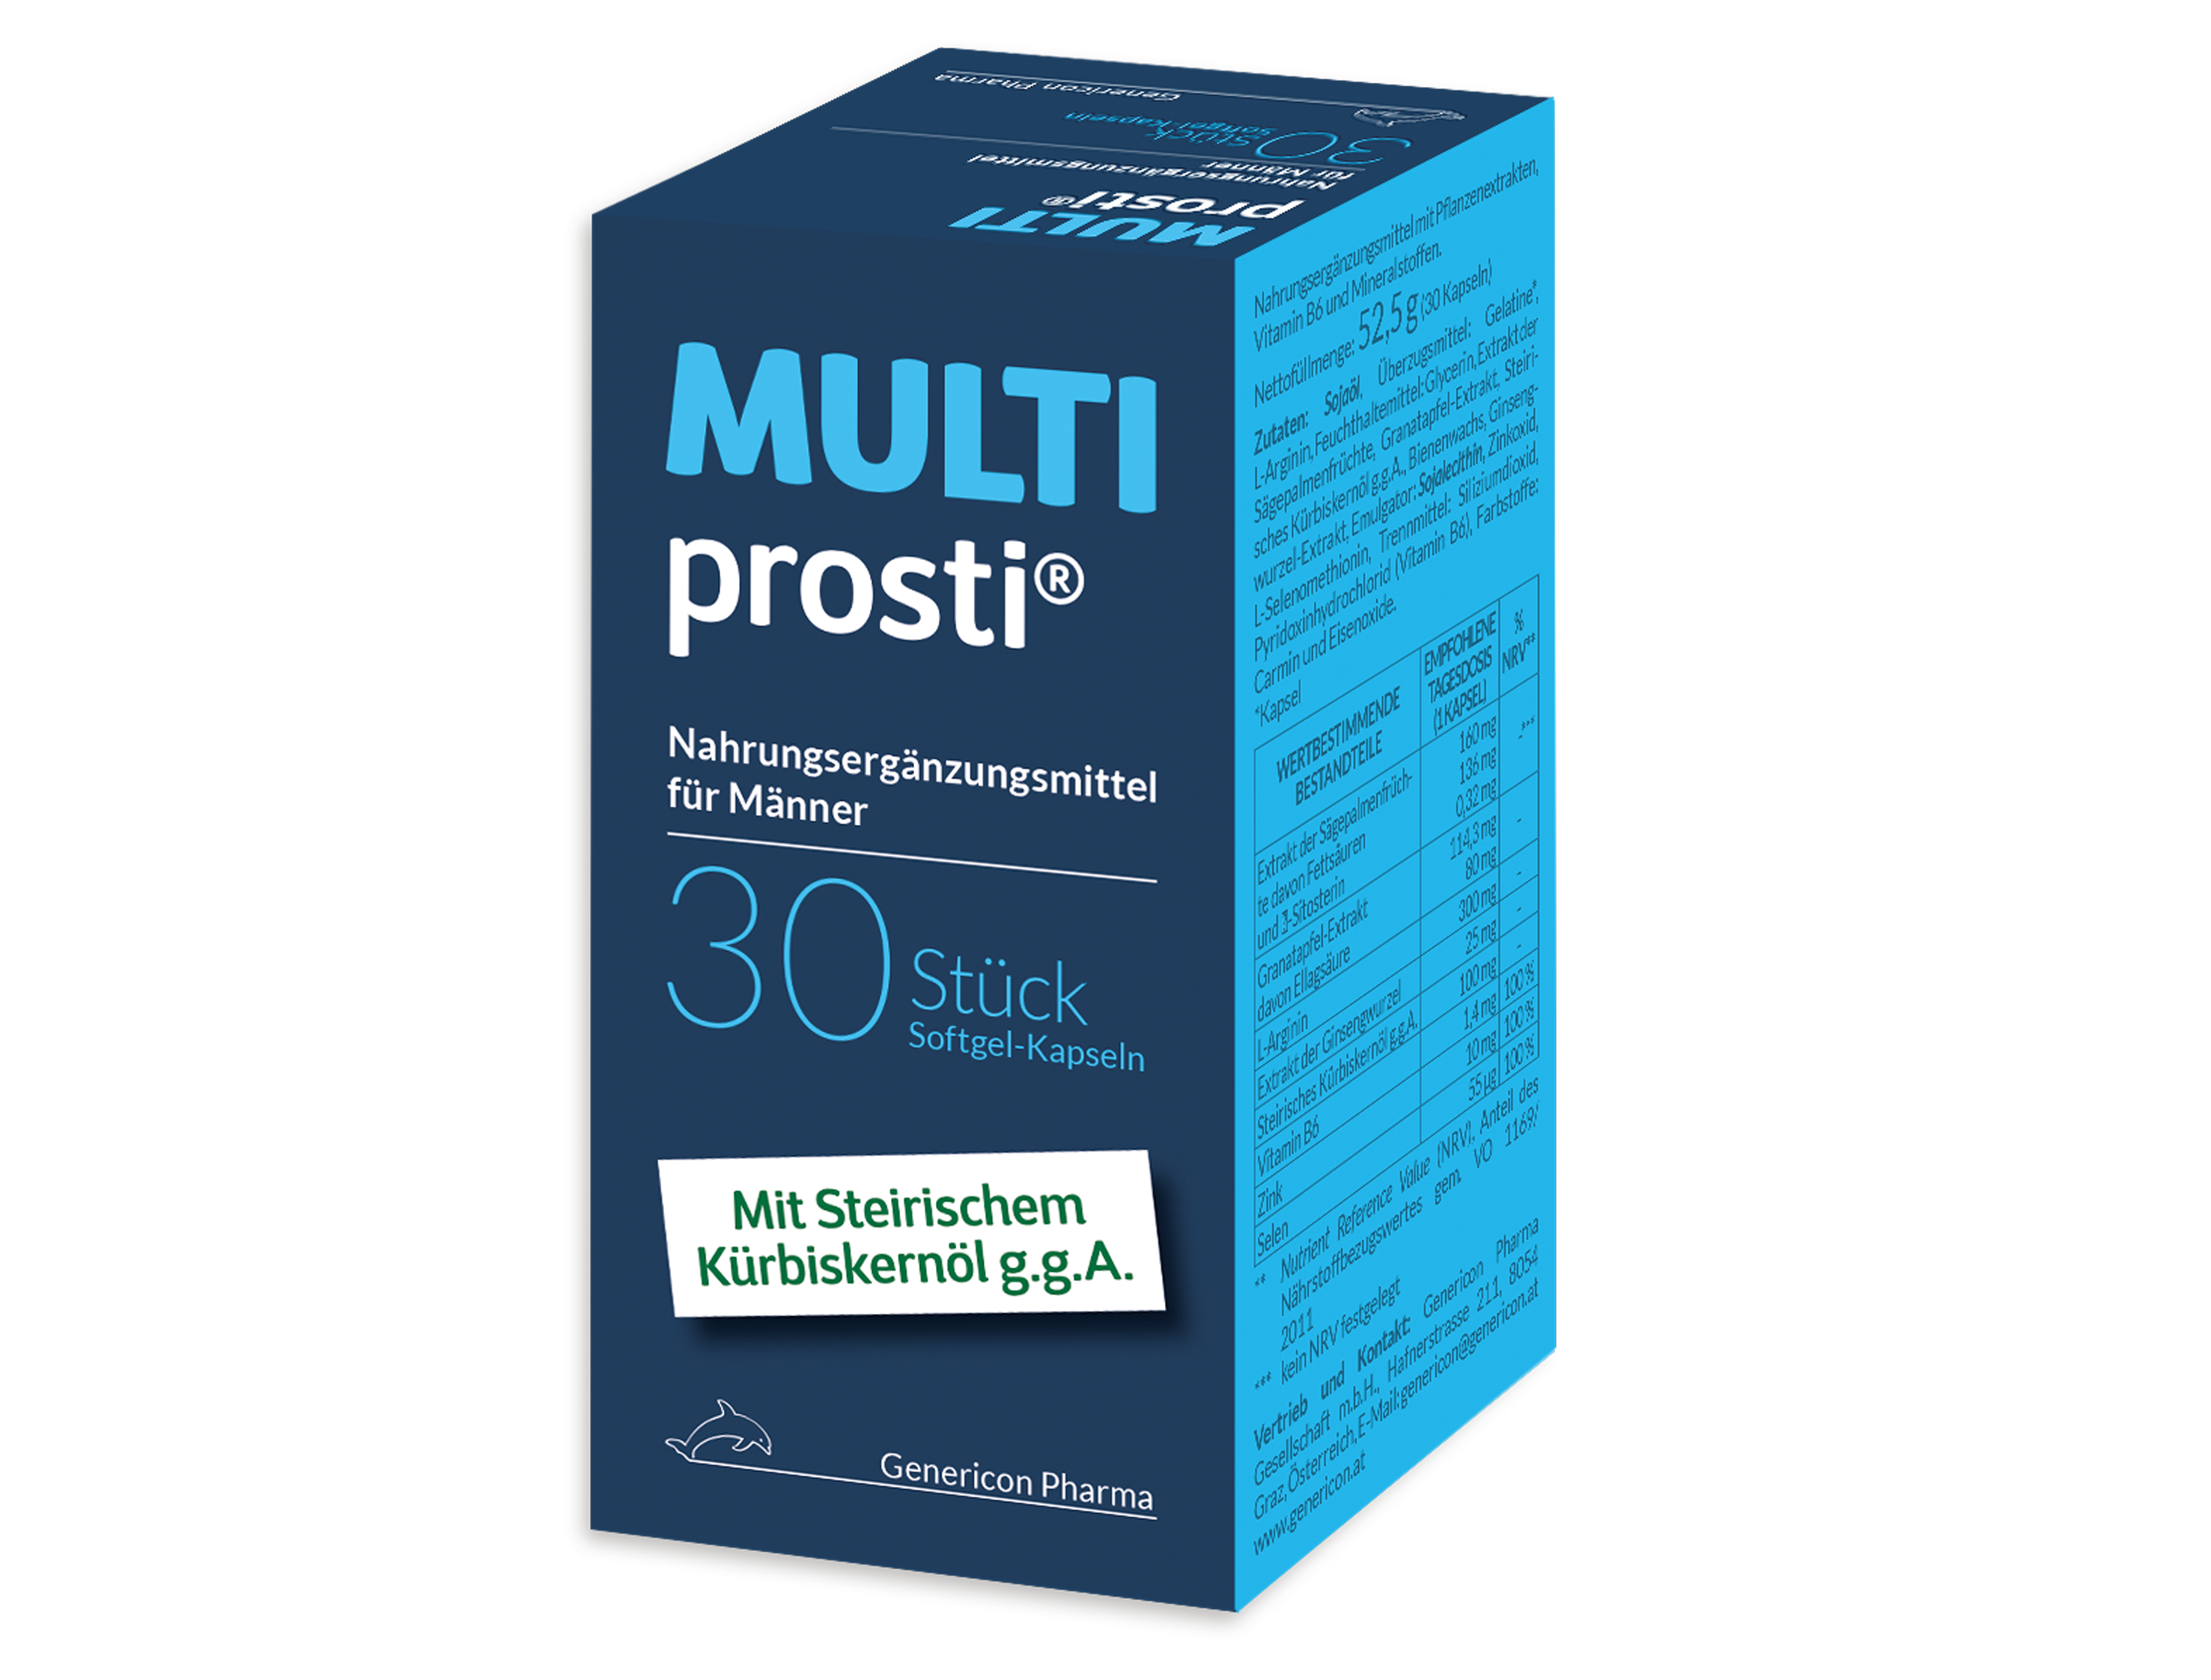 MULTIprosti®